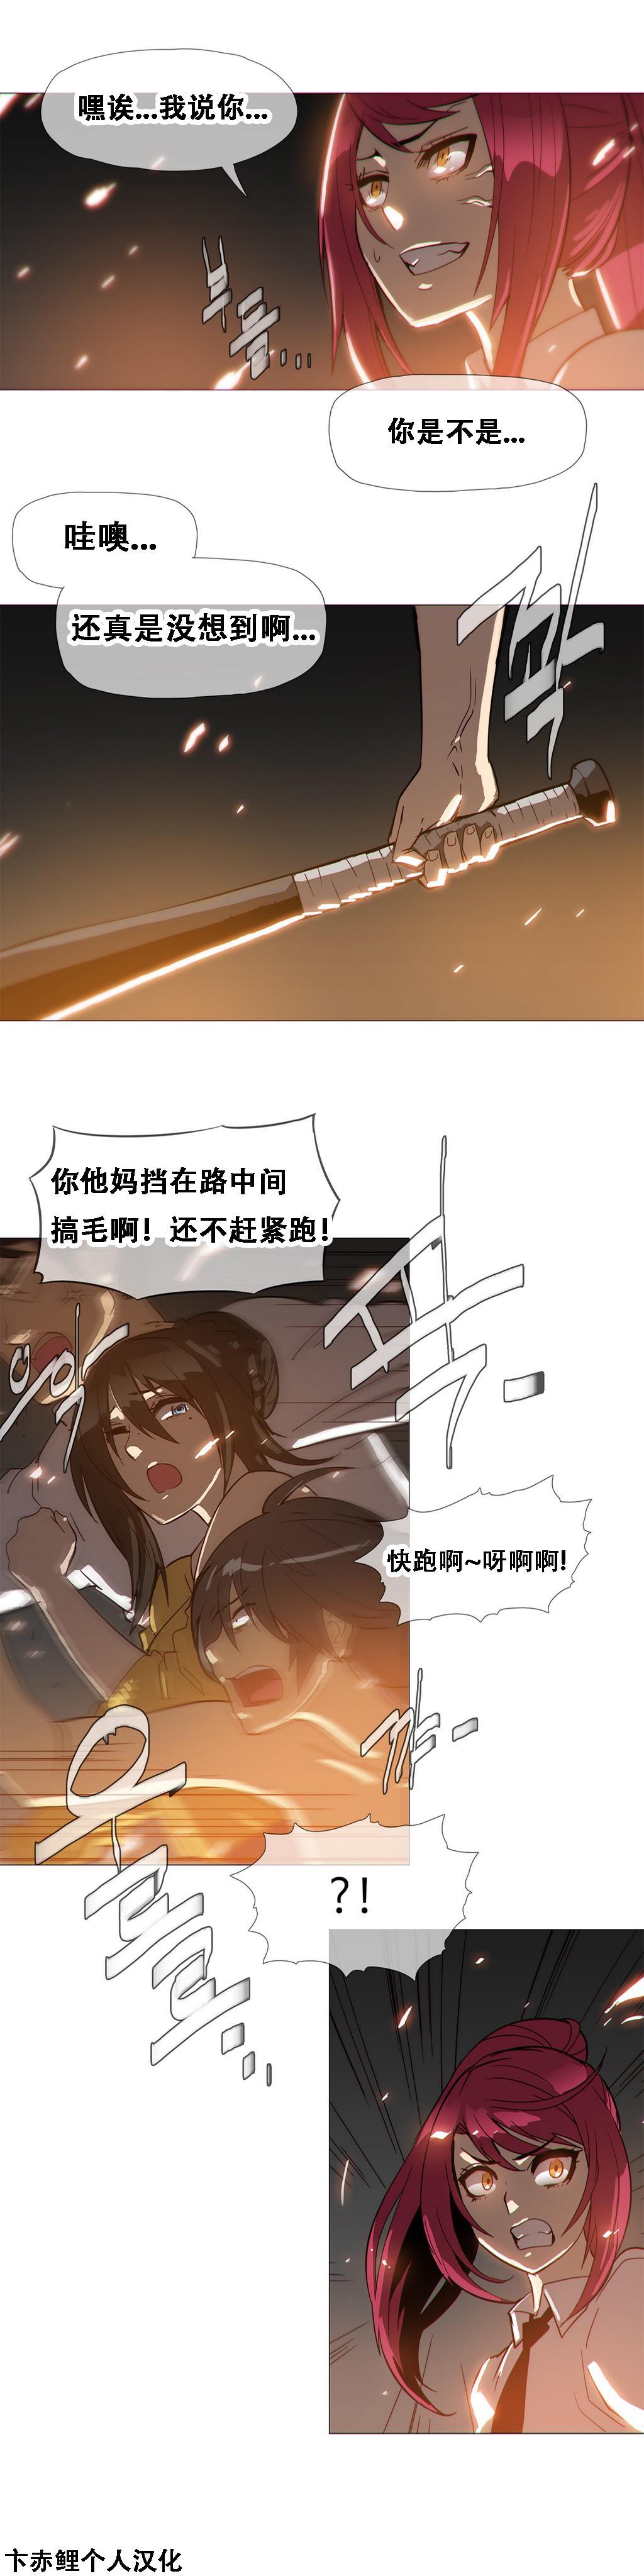 HouseHold Affairs 【卞赤鲤个人汉化】1~21话(持续更新中) 378